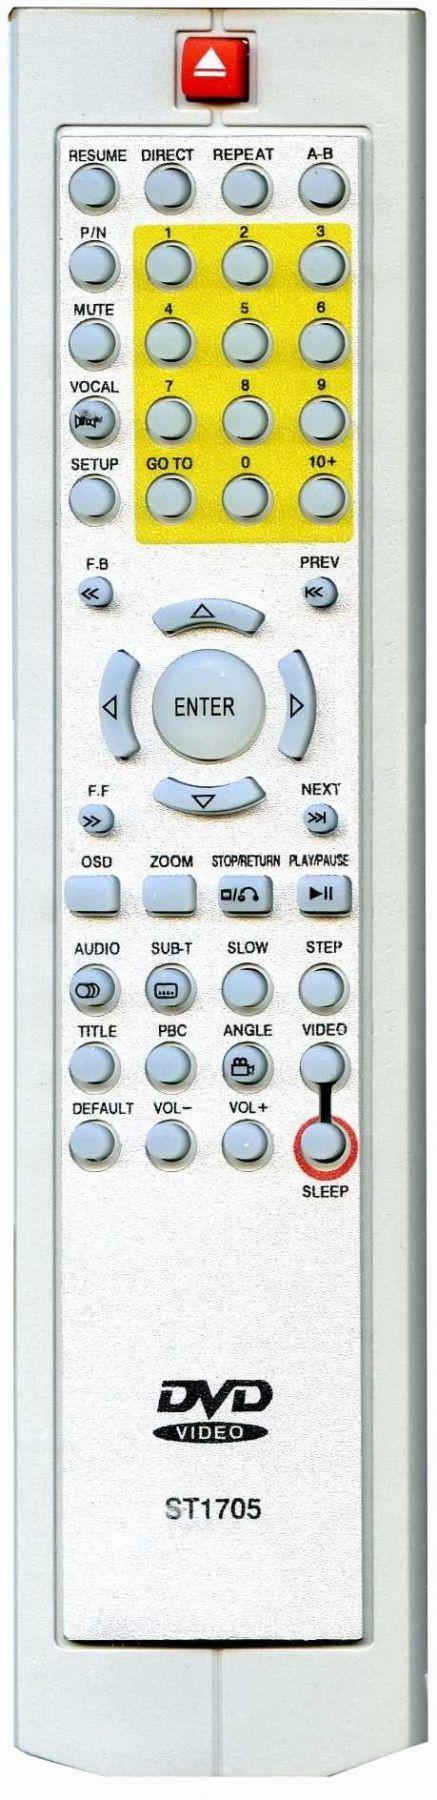 Пульт для Saturn ST1705 (DVD)